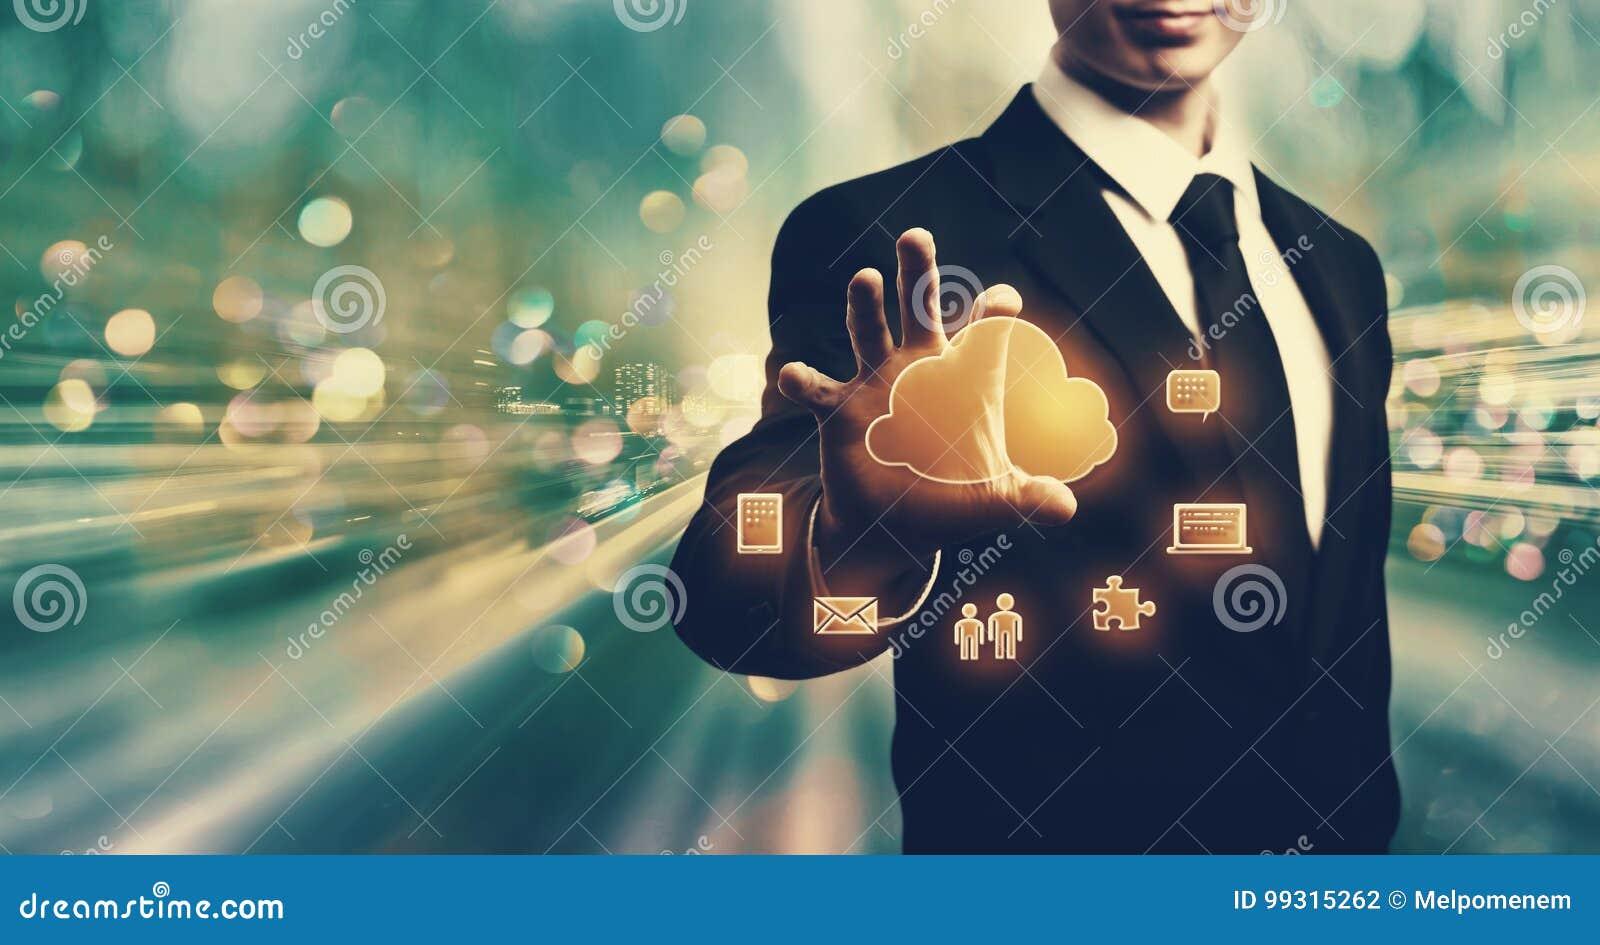 Cloud Computing with businessman